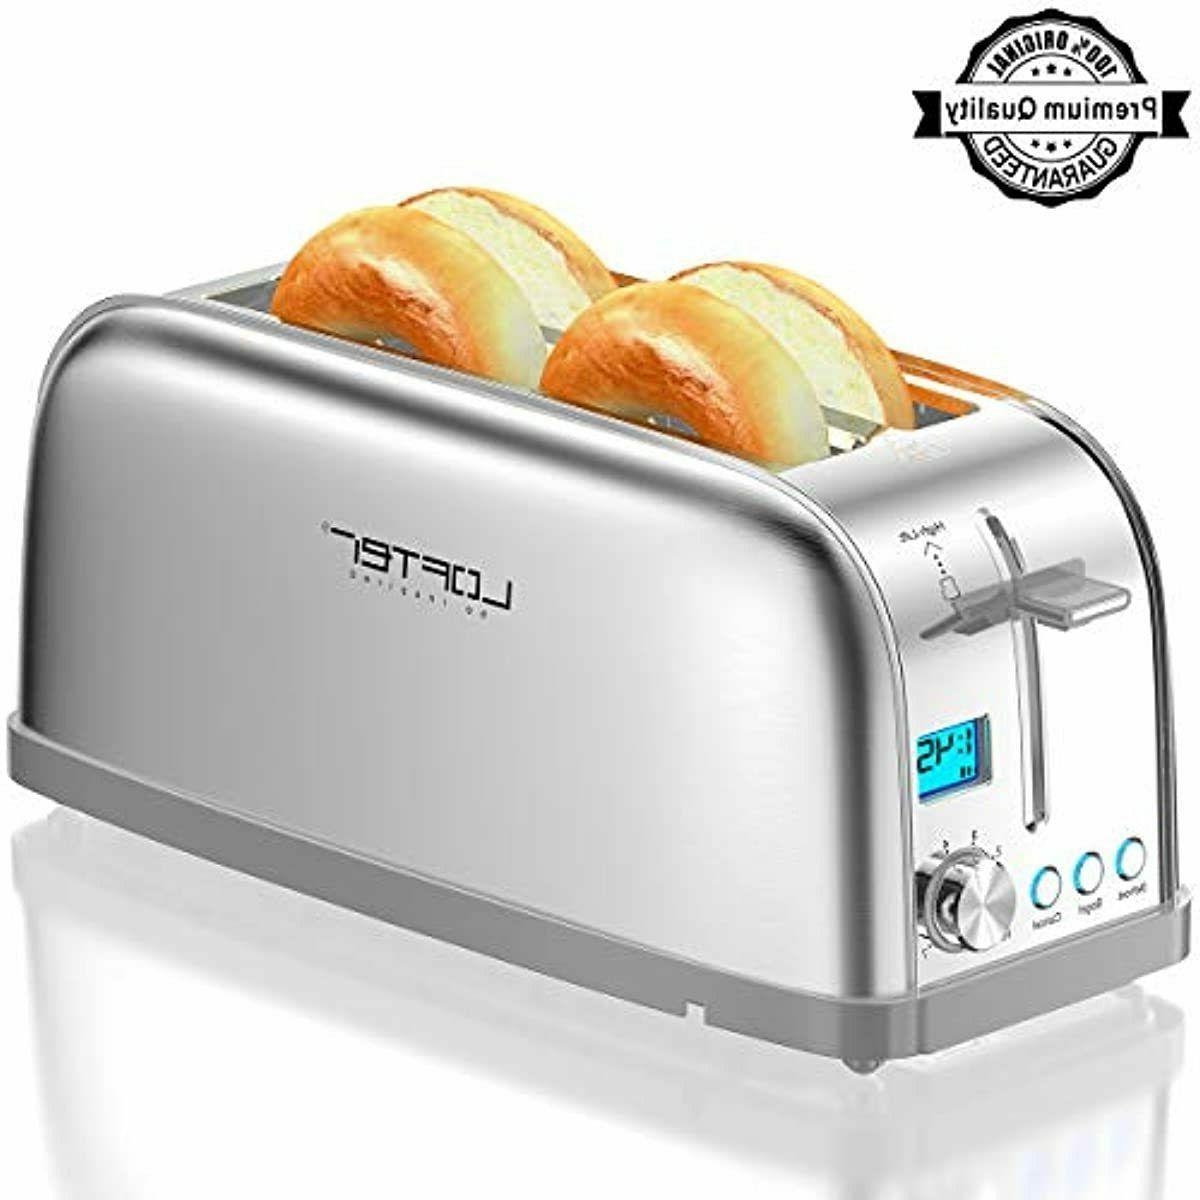 4 slice toaster lofter long slot toasters